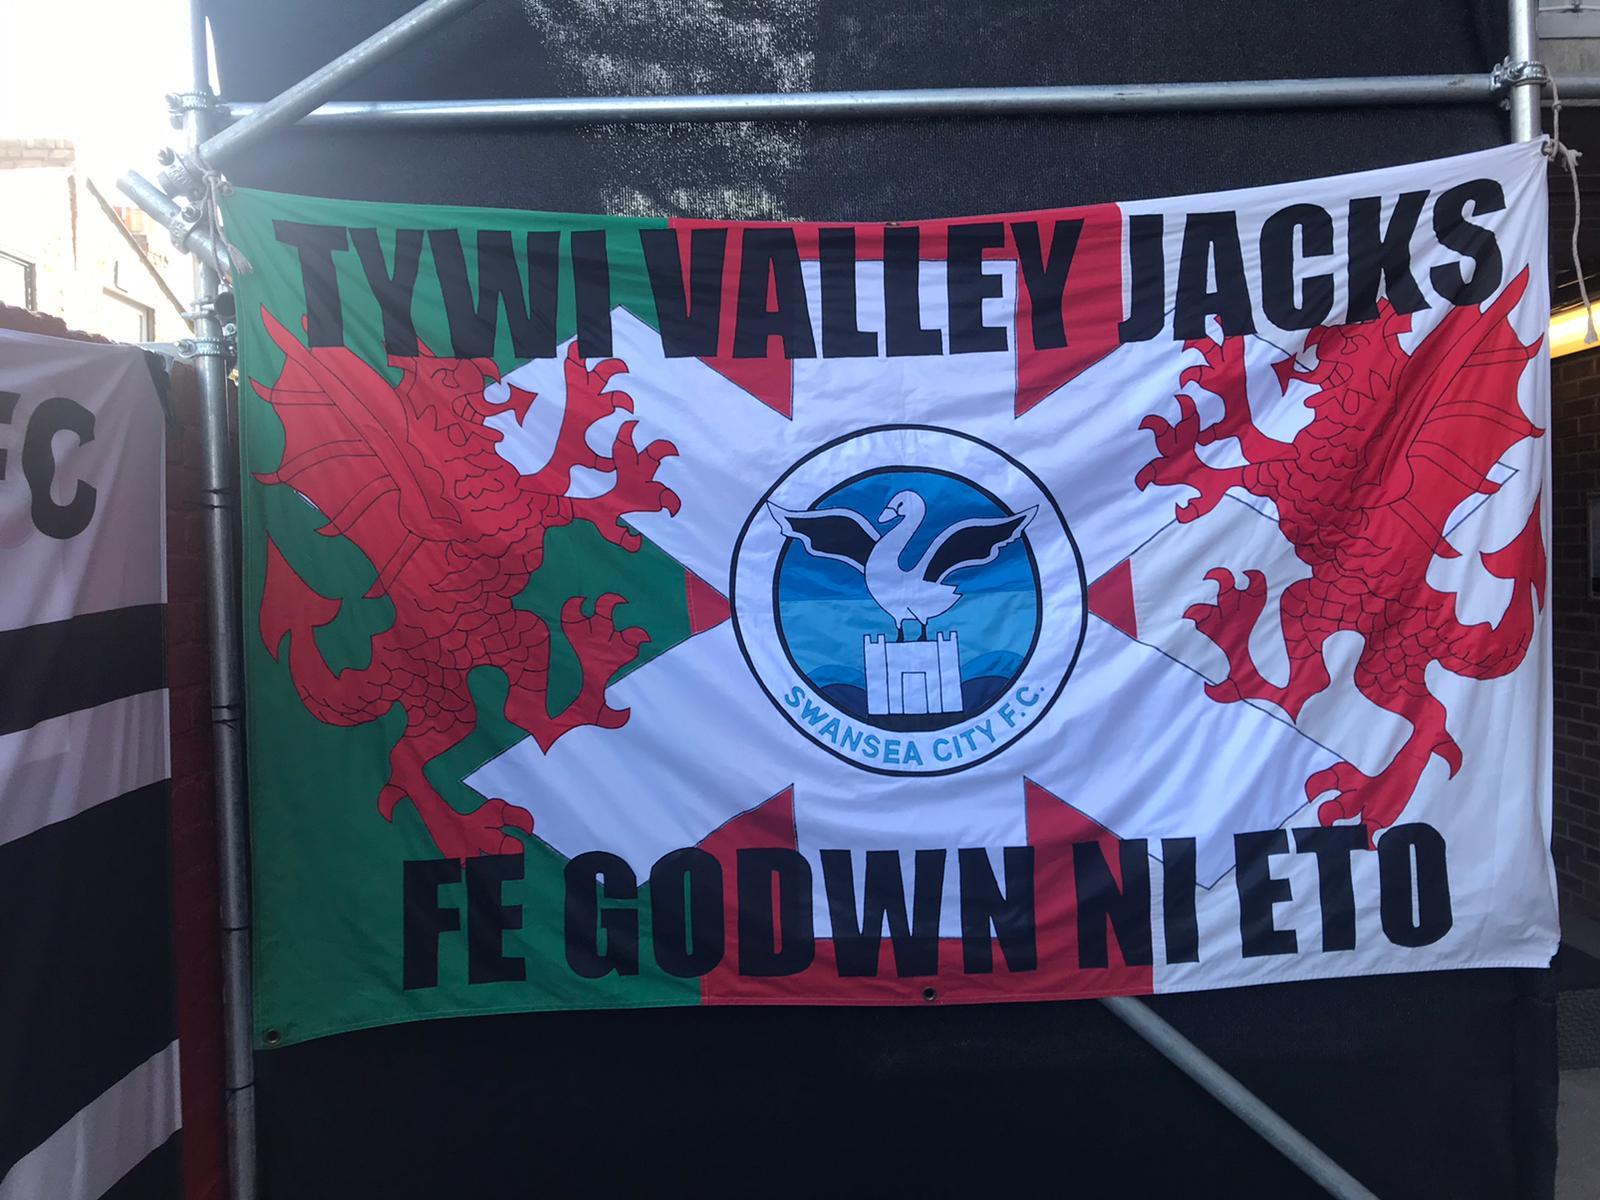 Swansea City flags Brentford (A)